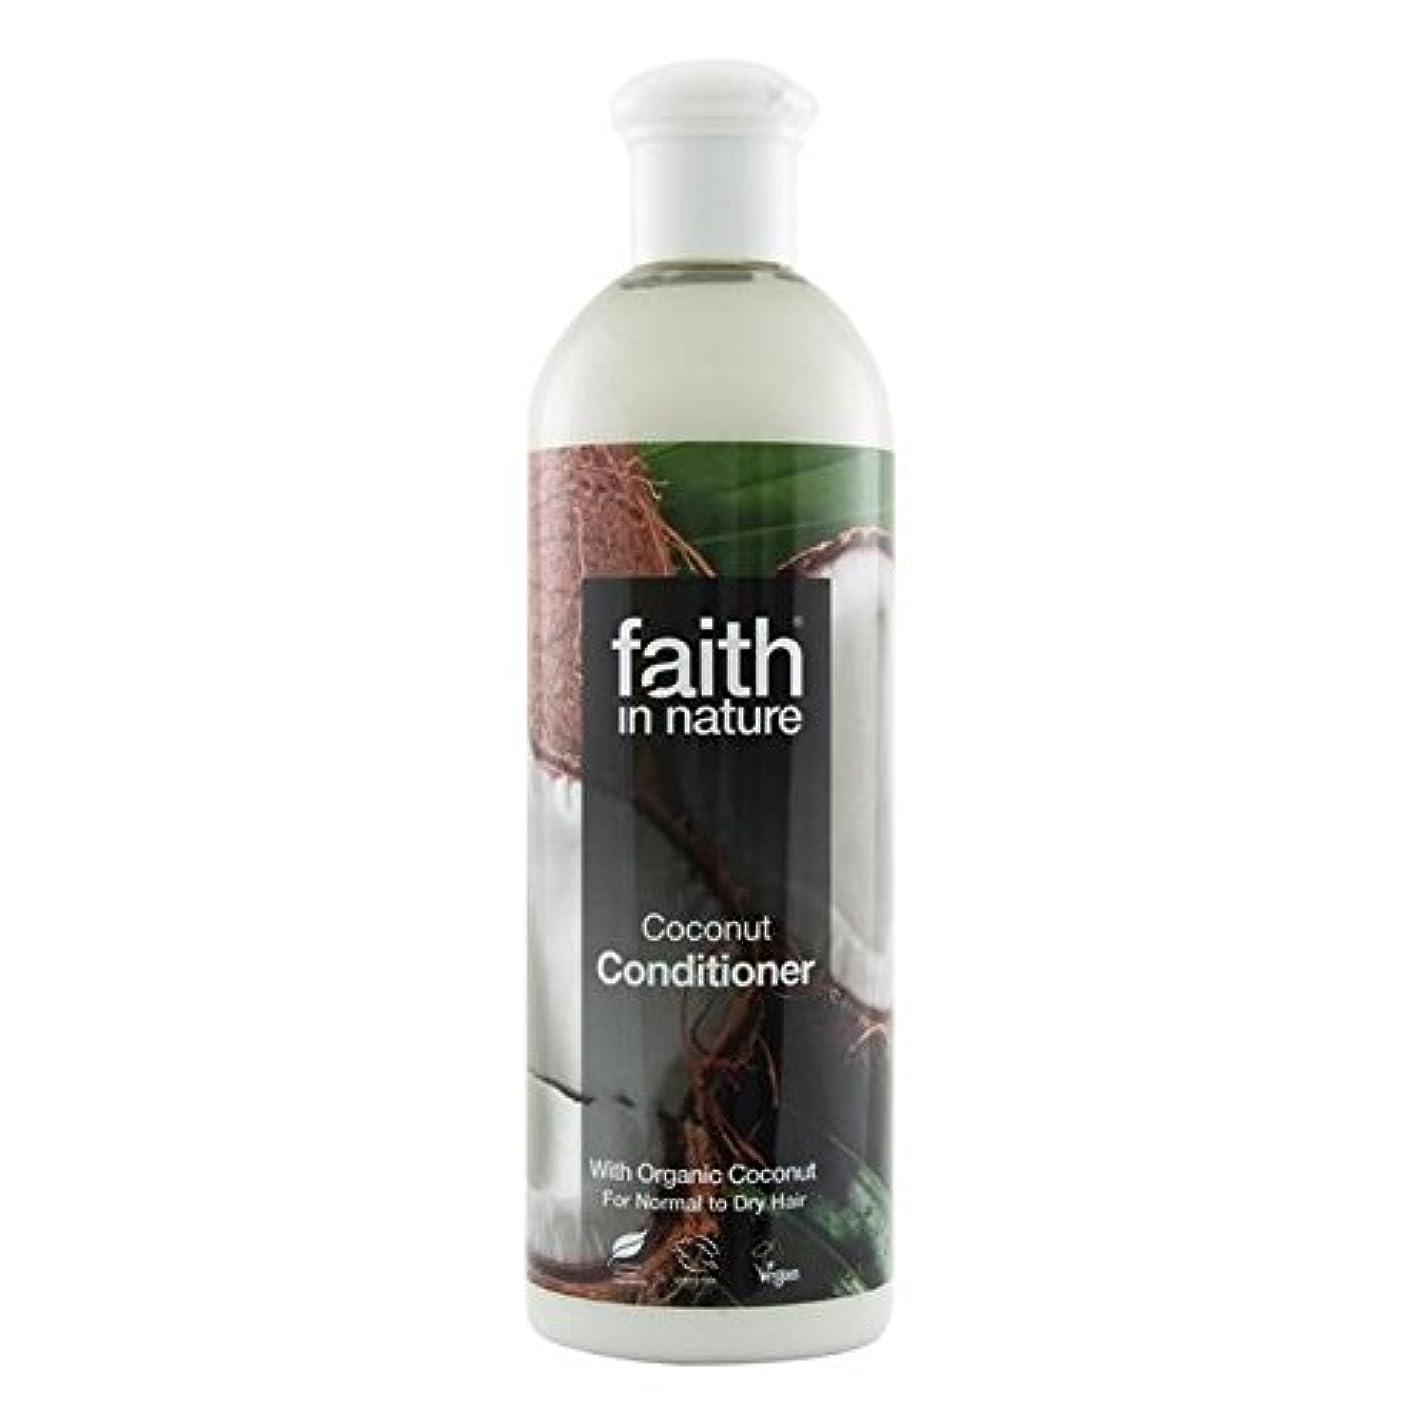 Faith in Nature Coconut Conditioner 400ml (Pack of 6) - (Faith In Nature) 自然ココナッツコンディショナー400ミリリットルの信仰 (x6) [並行輸入品]